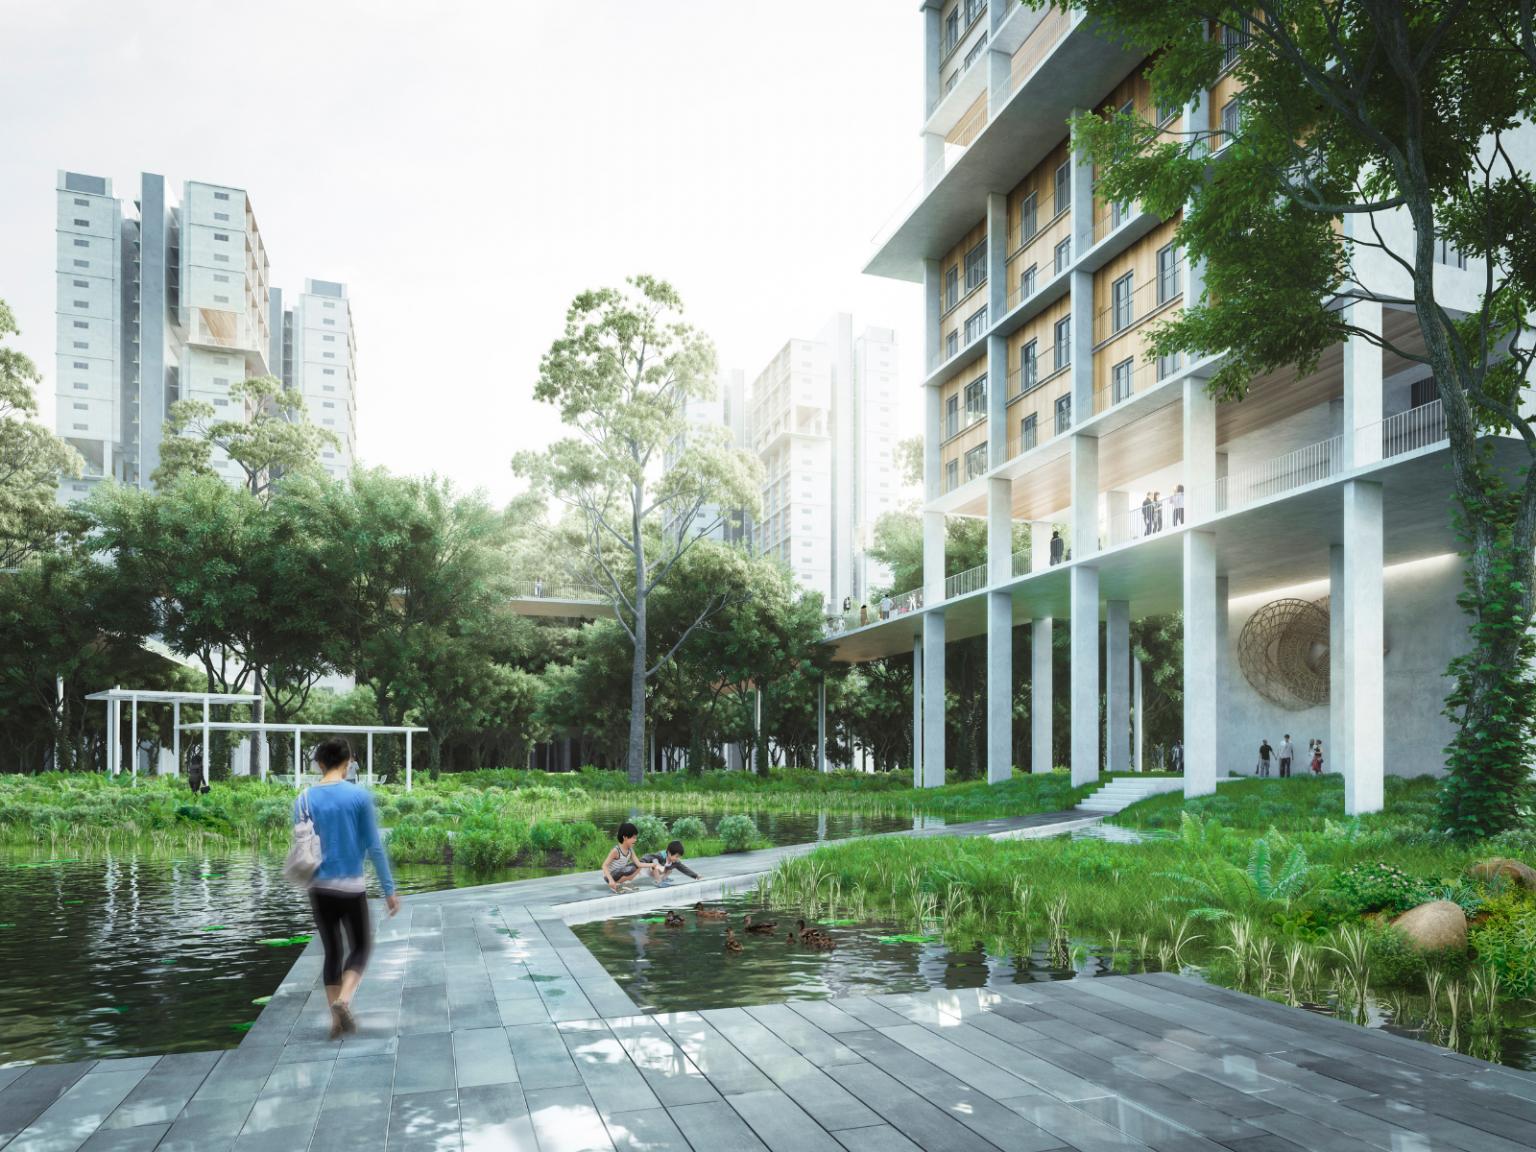 Image credit: MKPL Architects